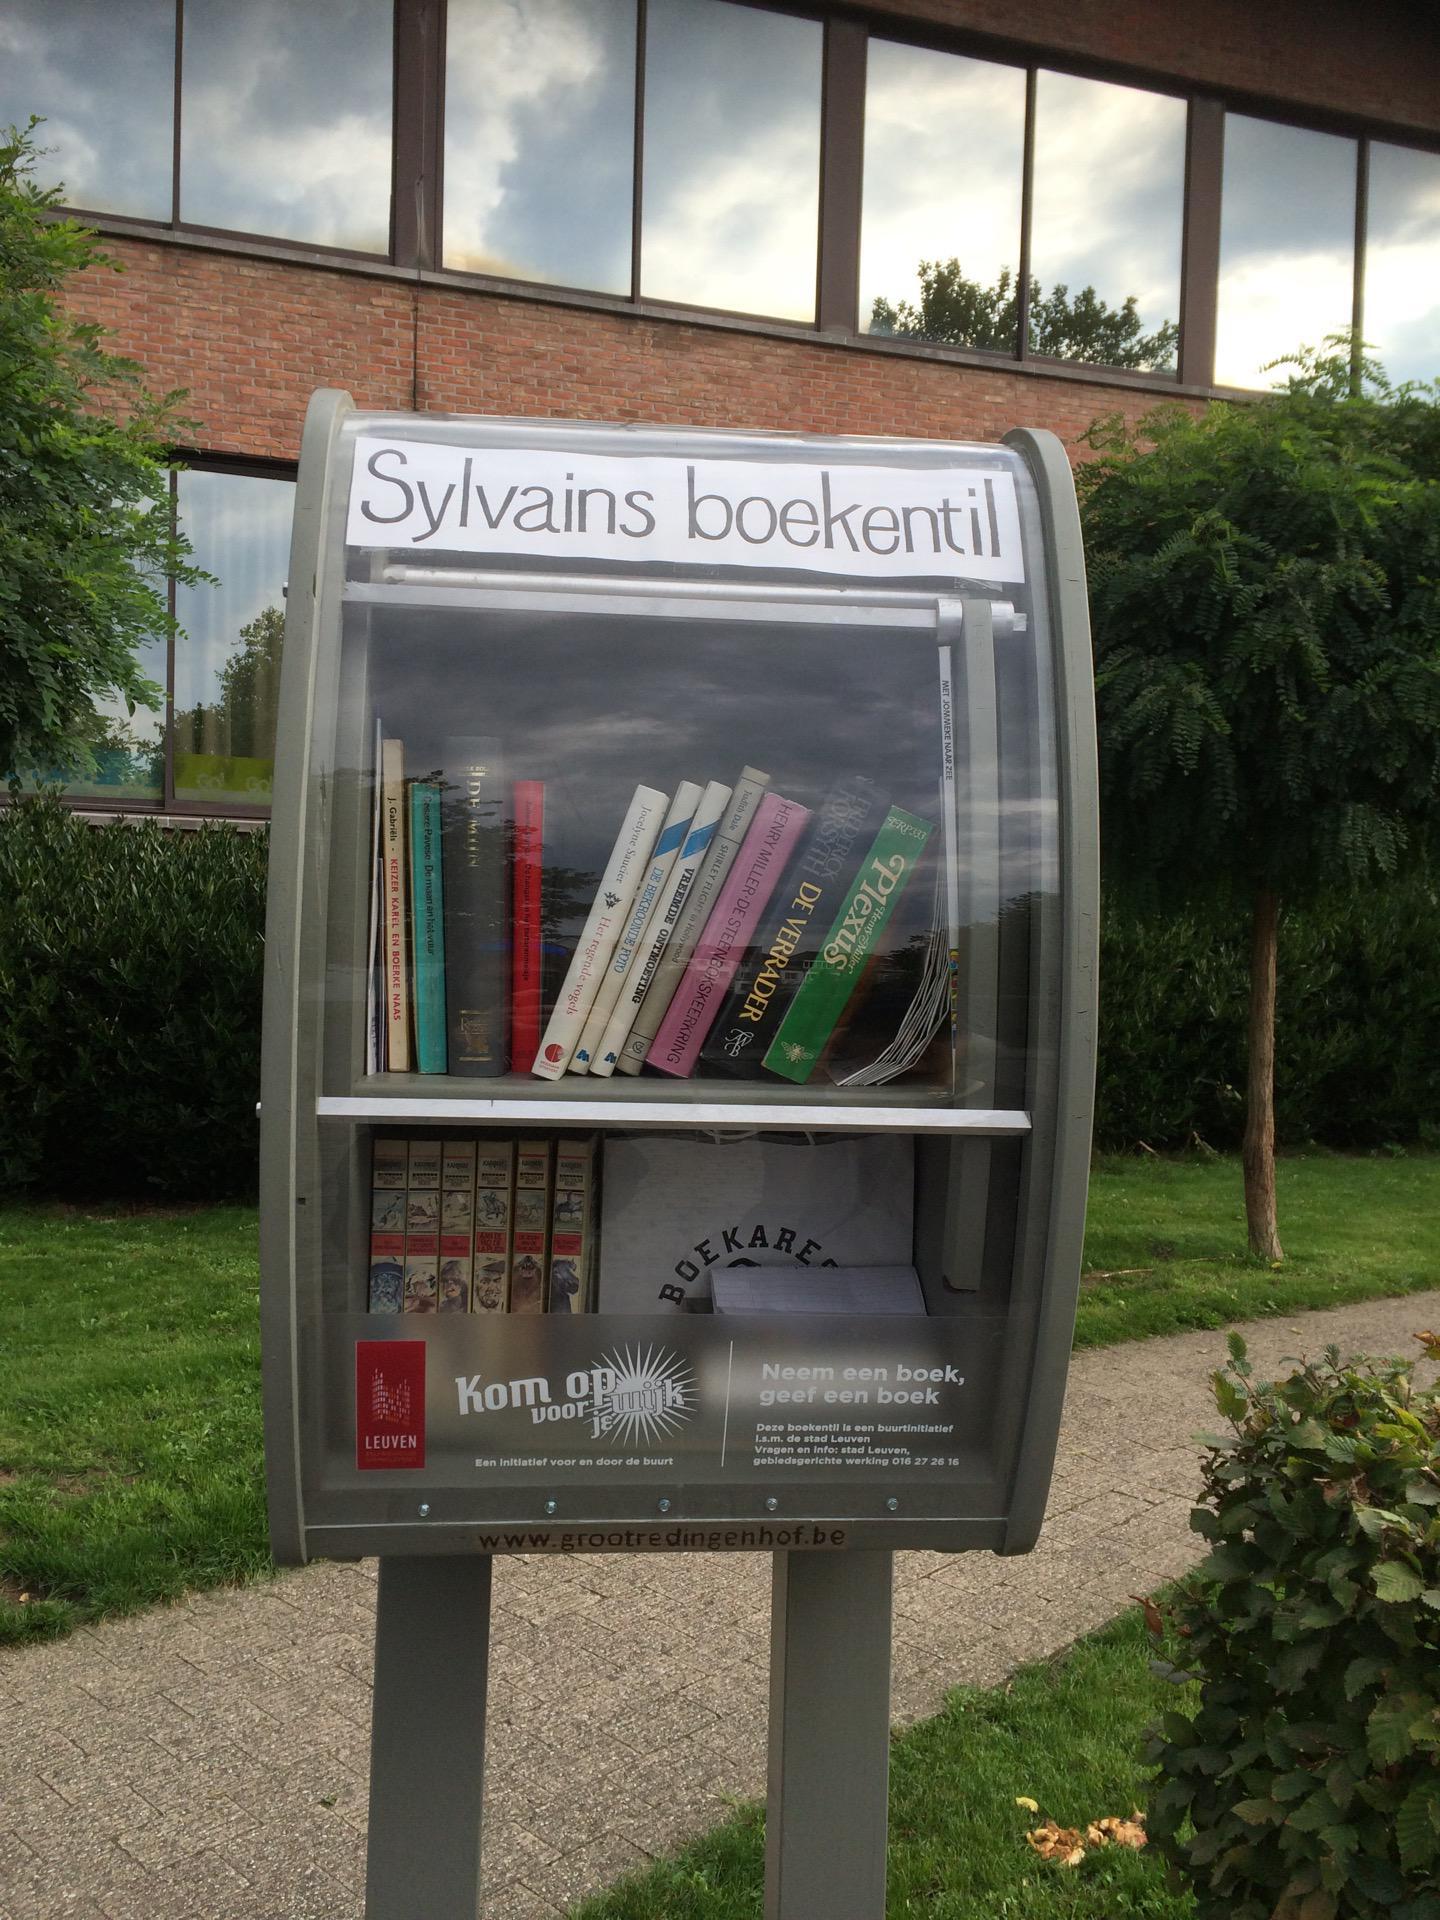 Sylvains Boekentil Leuven